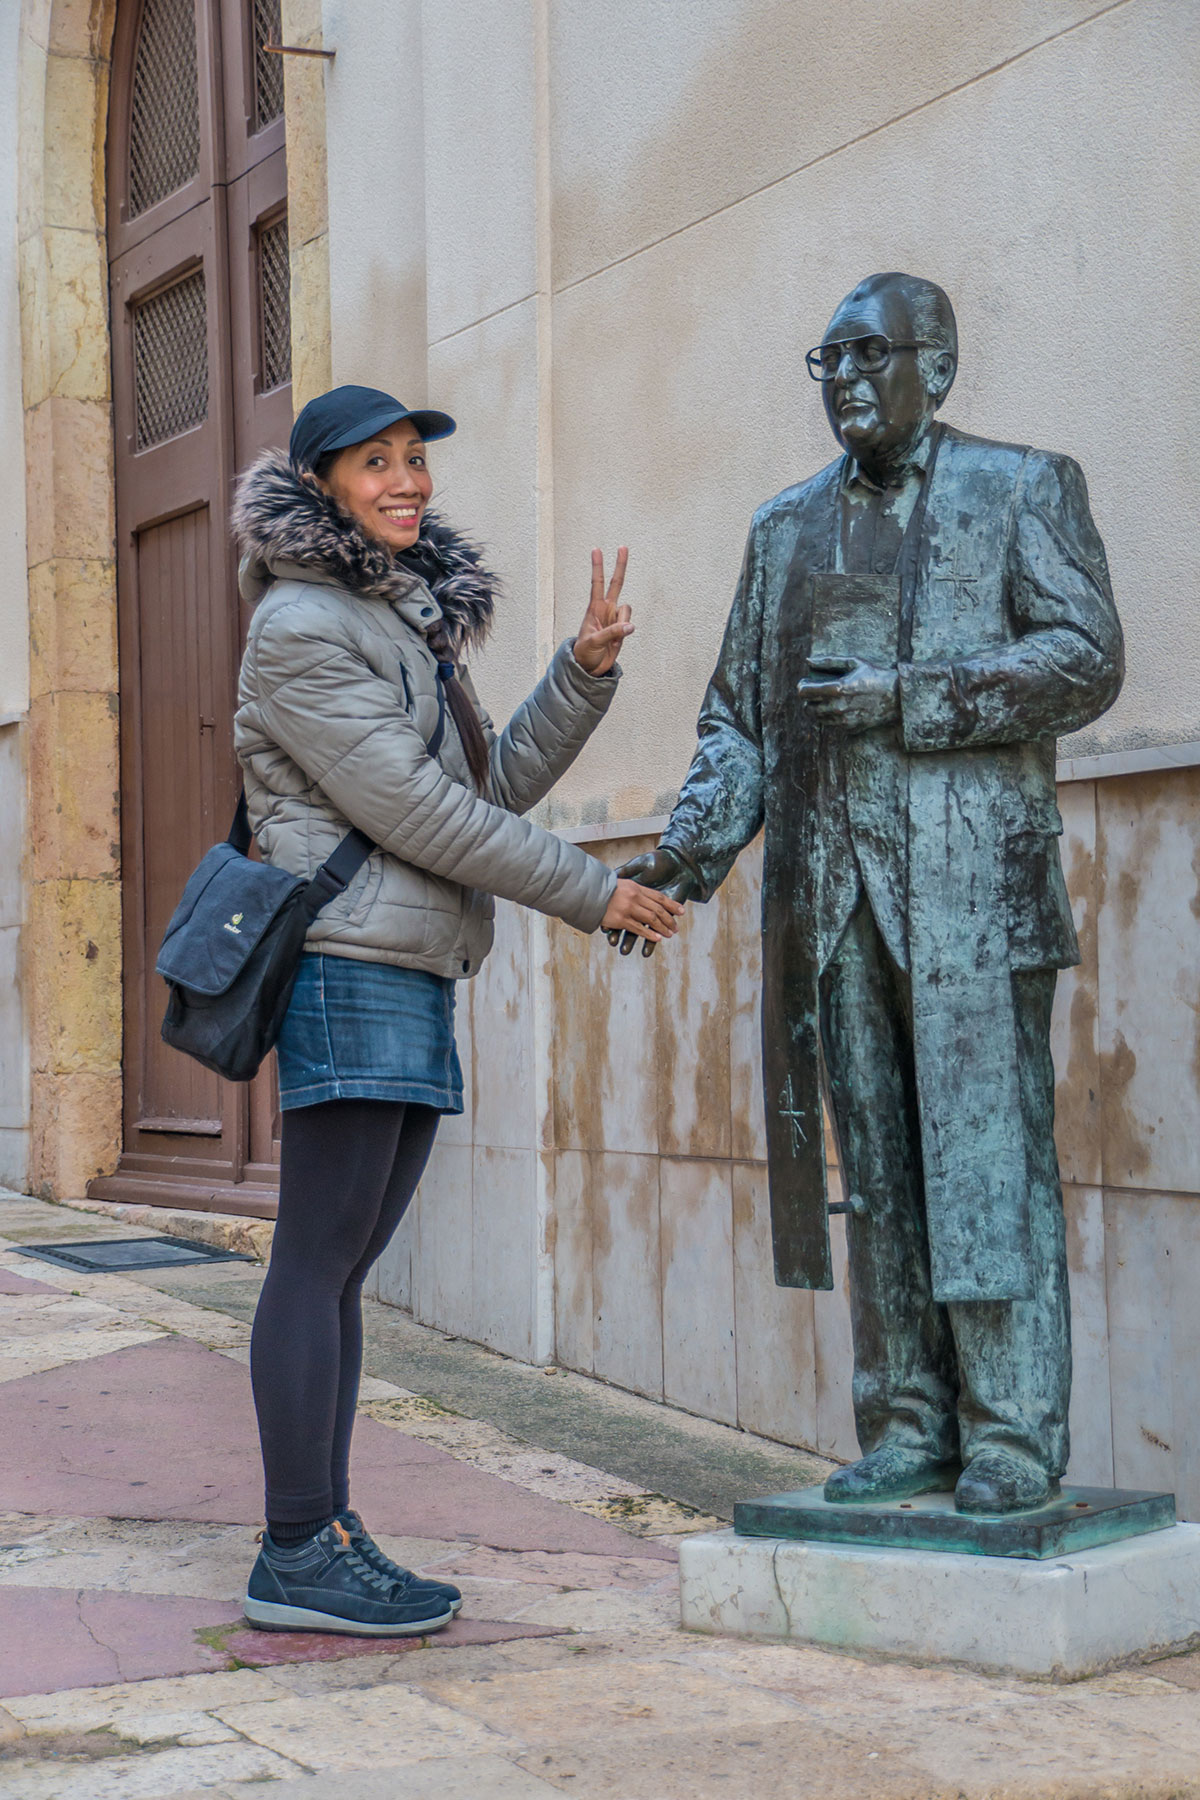 Spanien, Katalonien, Tarragona, Statue, Händeschütteln